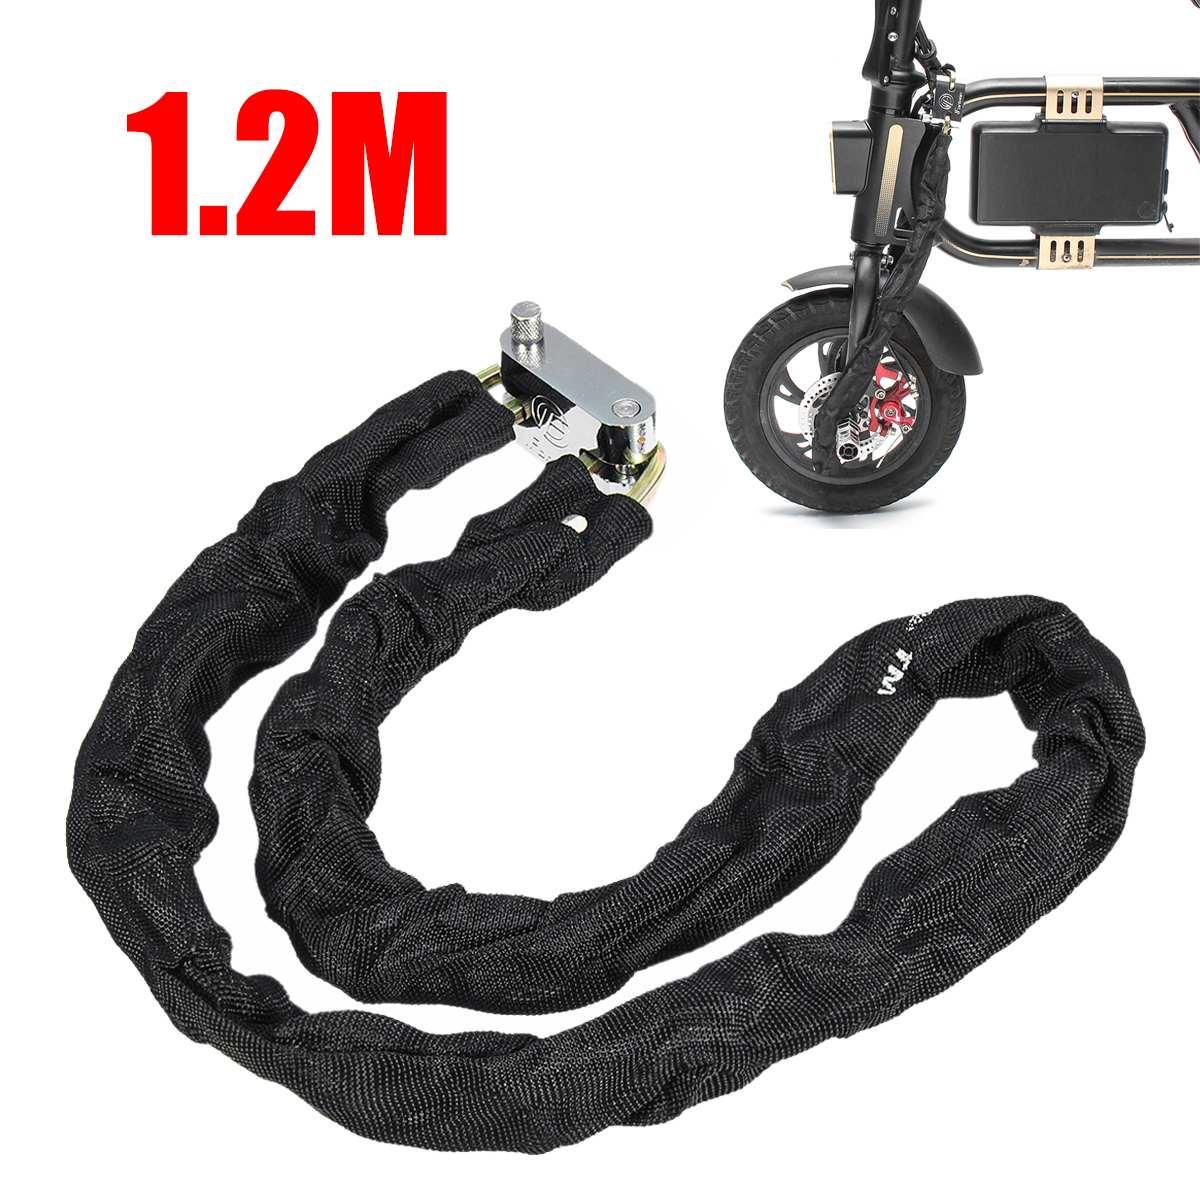 1.2M Metal Motorcycle Motorbike Heavy Duty Chain Lock Padlock Bicycle Scooter Locks Anti-theft Protection